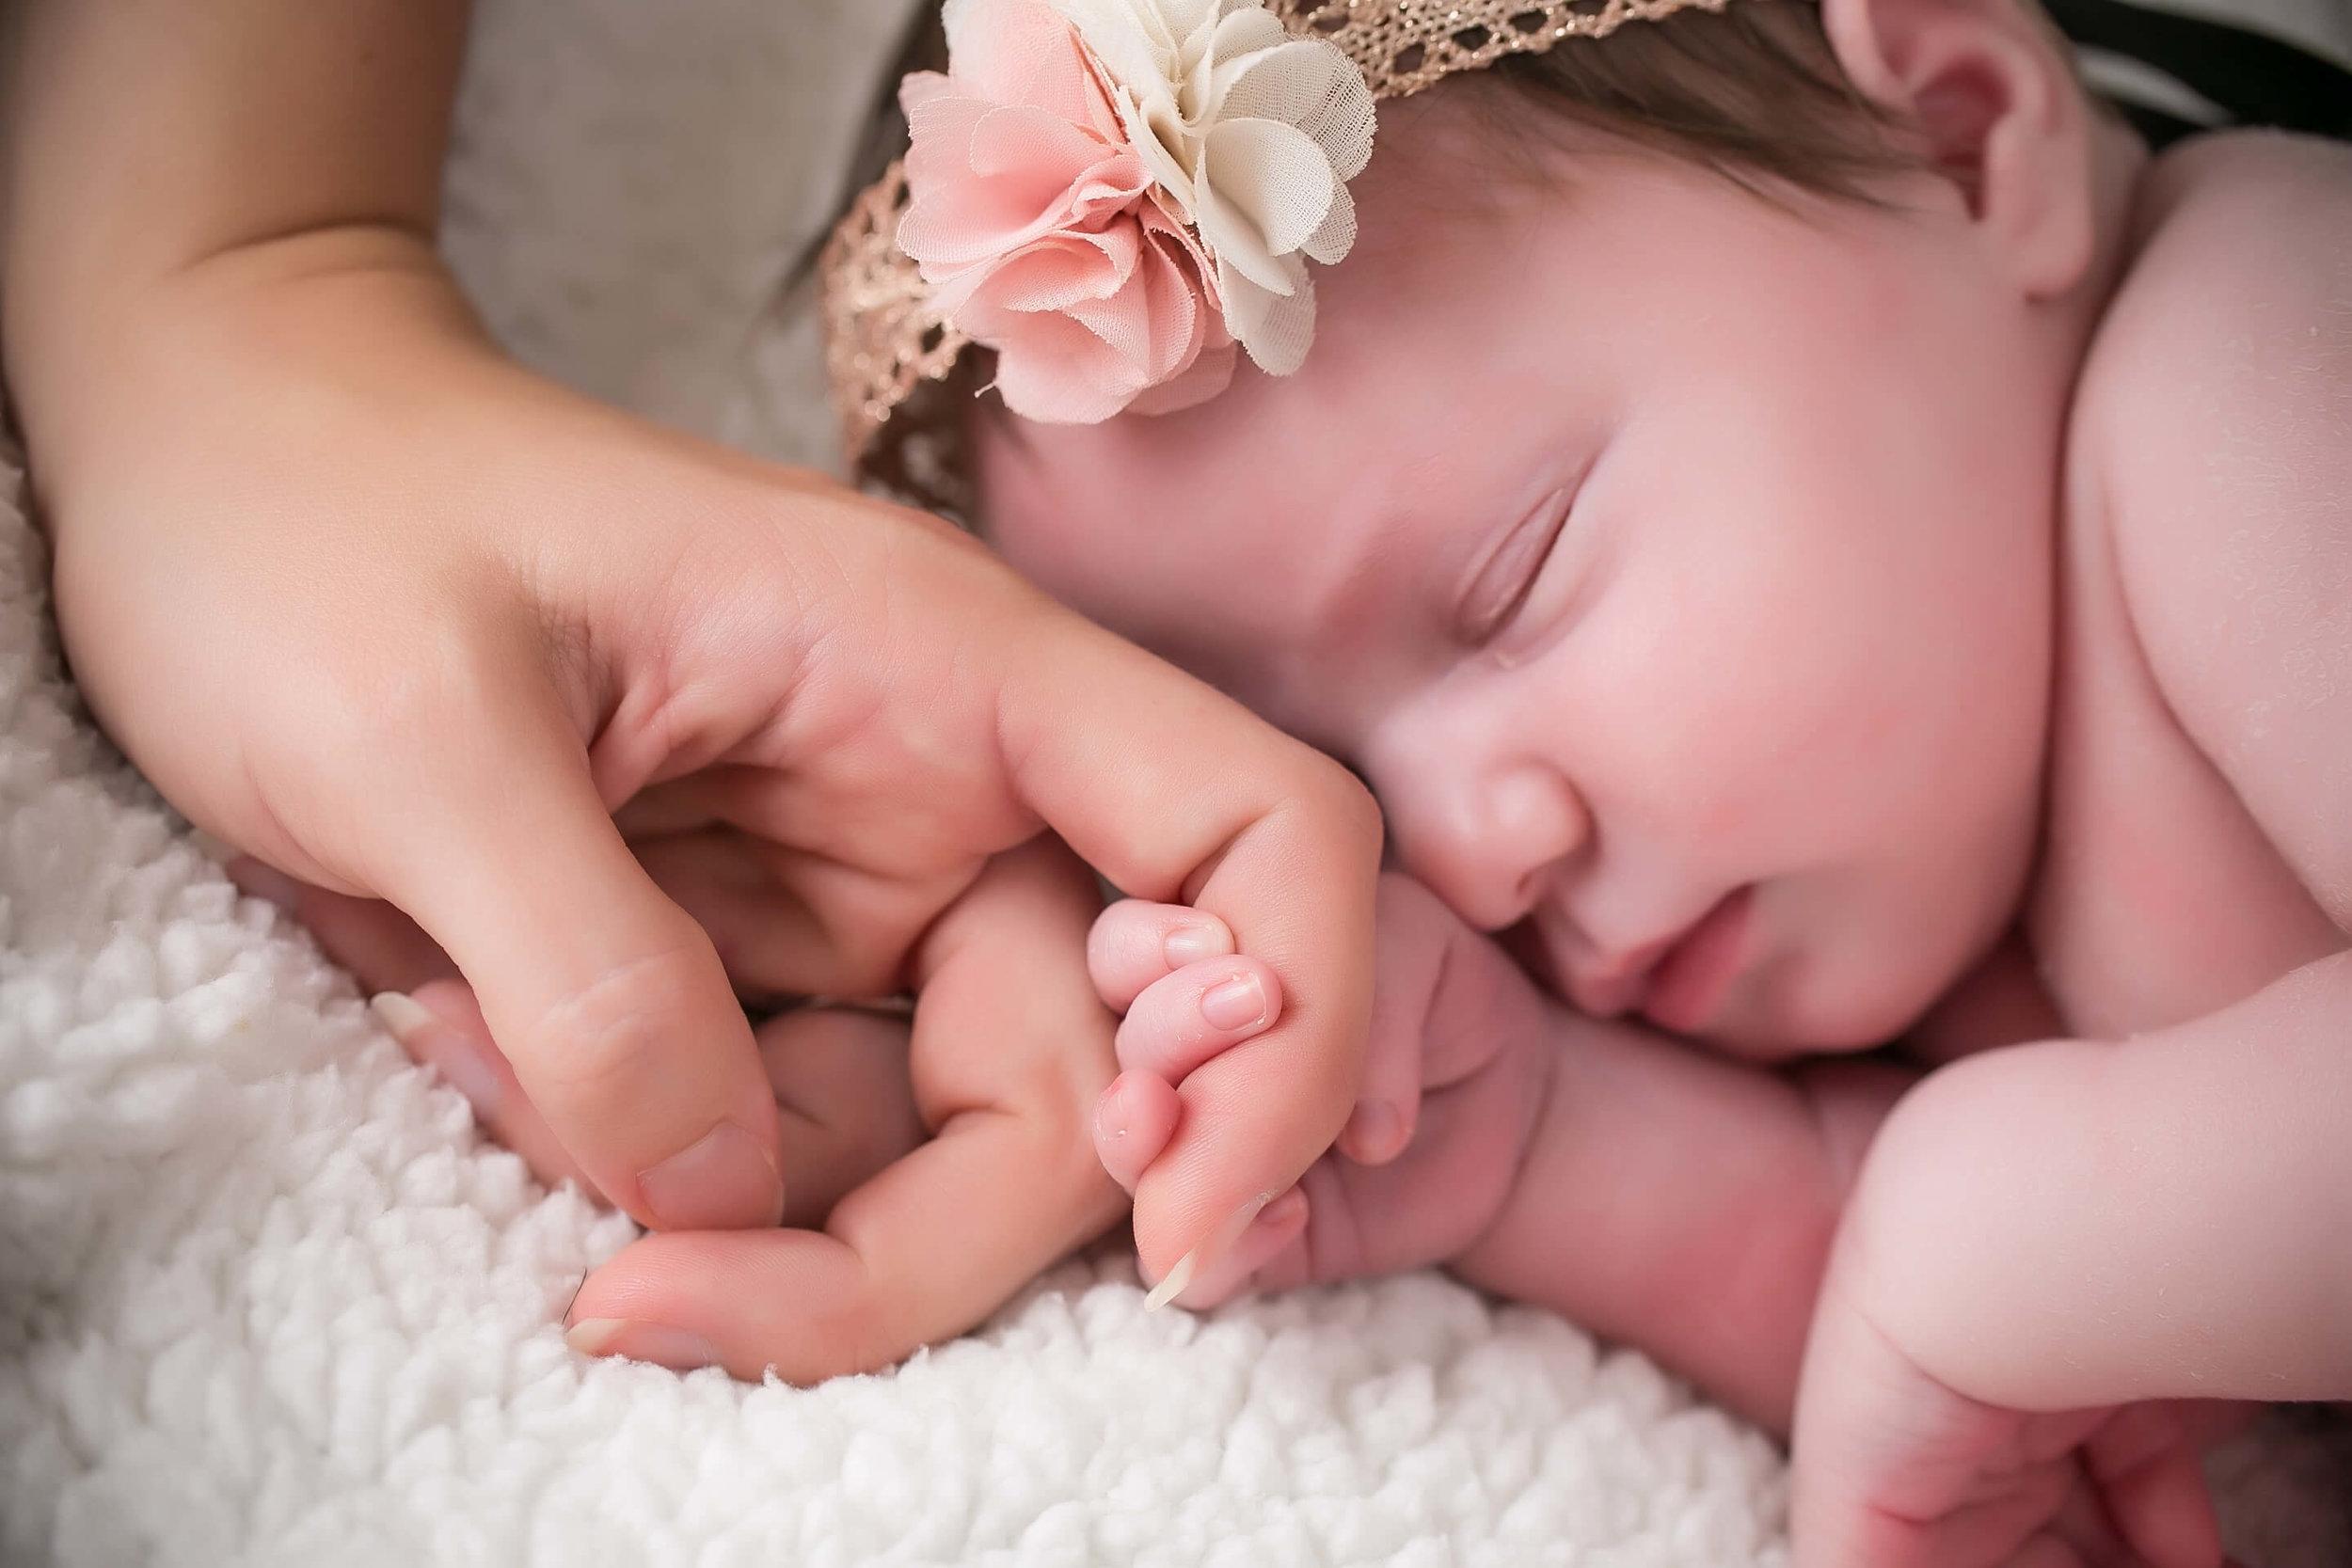 family-baby-newborn-childrens-photography-fairport-ny-27.jpg